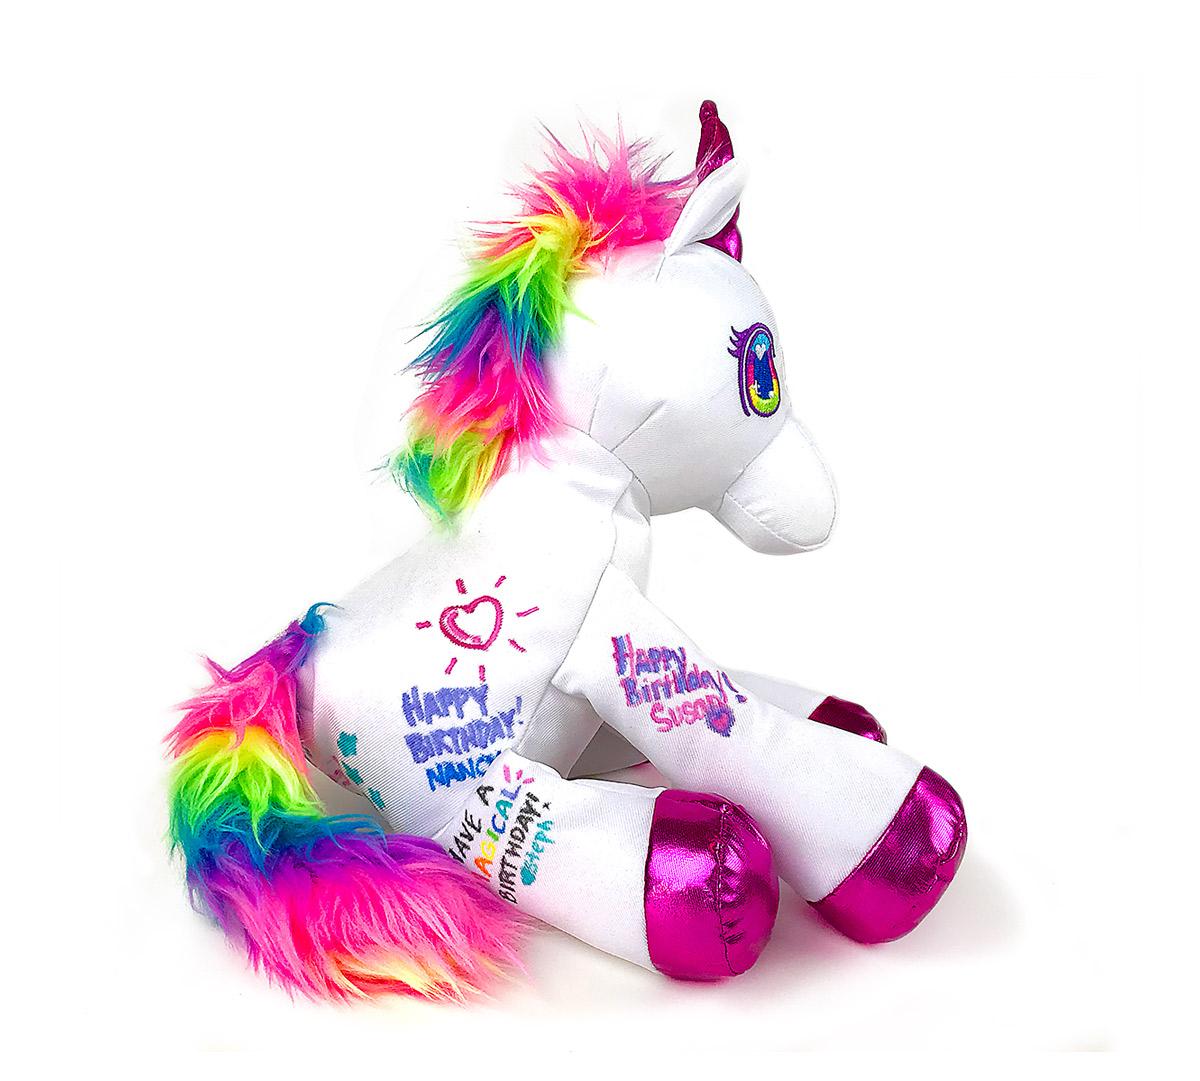 Plush Unicorn Toy, Autograph Animal | Crayola com | Crayola